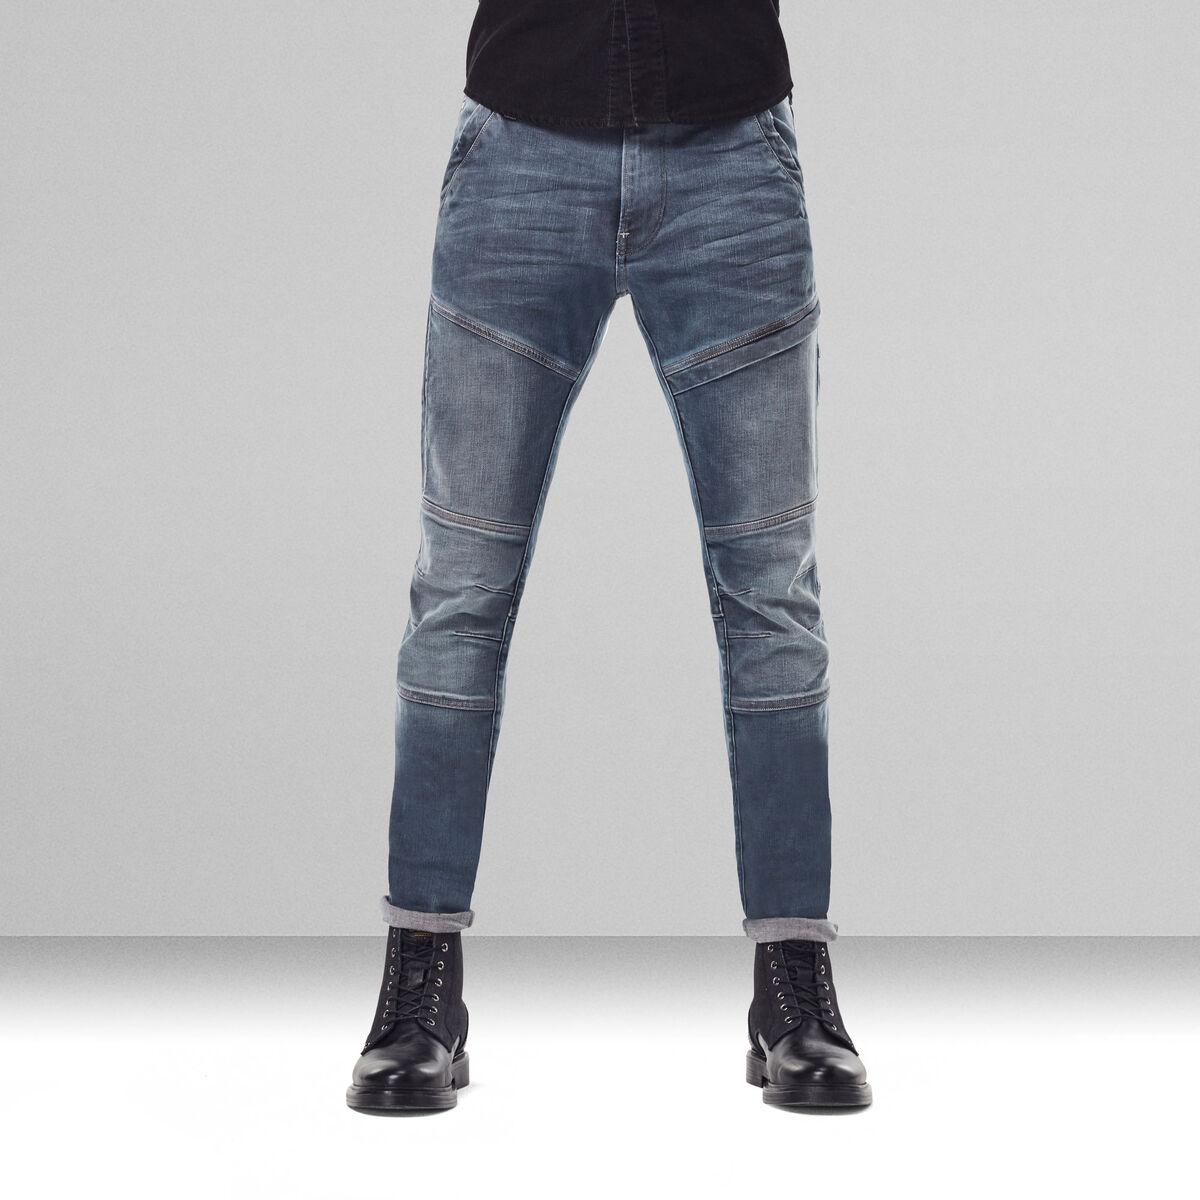 Bild 1 von Rackam 3D Skinny Jeans